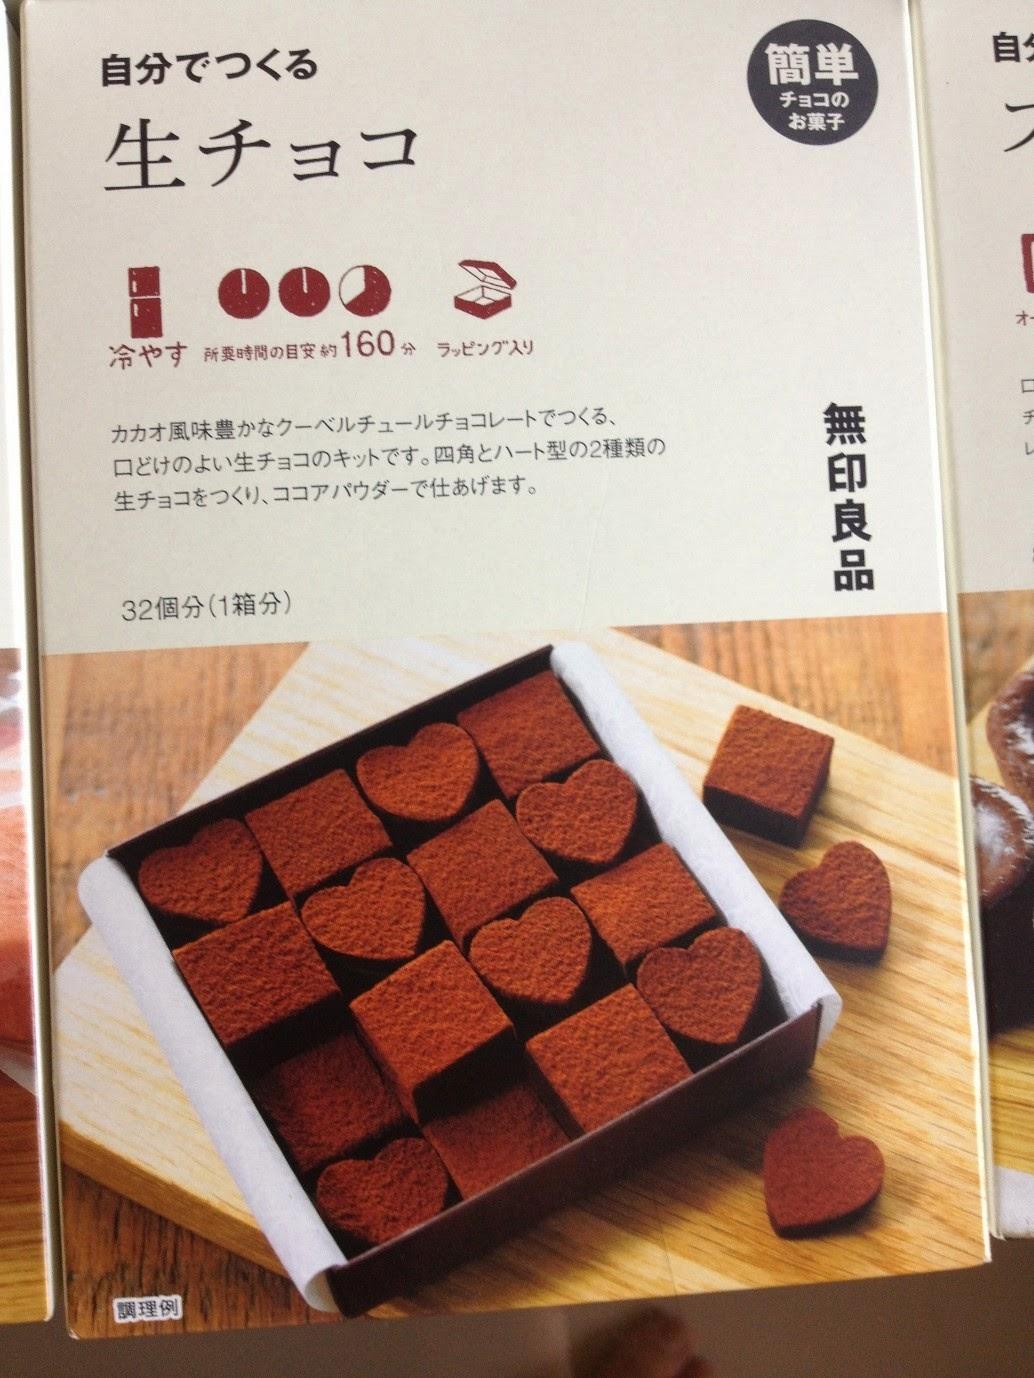 The Miaos: Valentine DIYs - Muji's Heart Shaped Chocolate Crunch